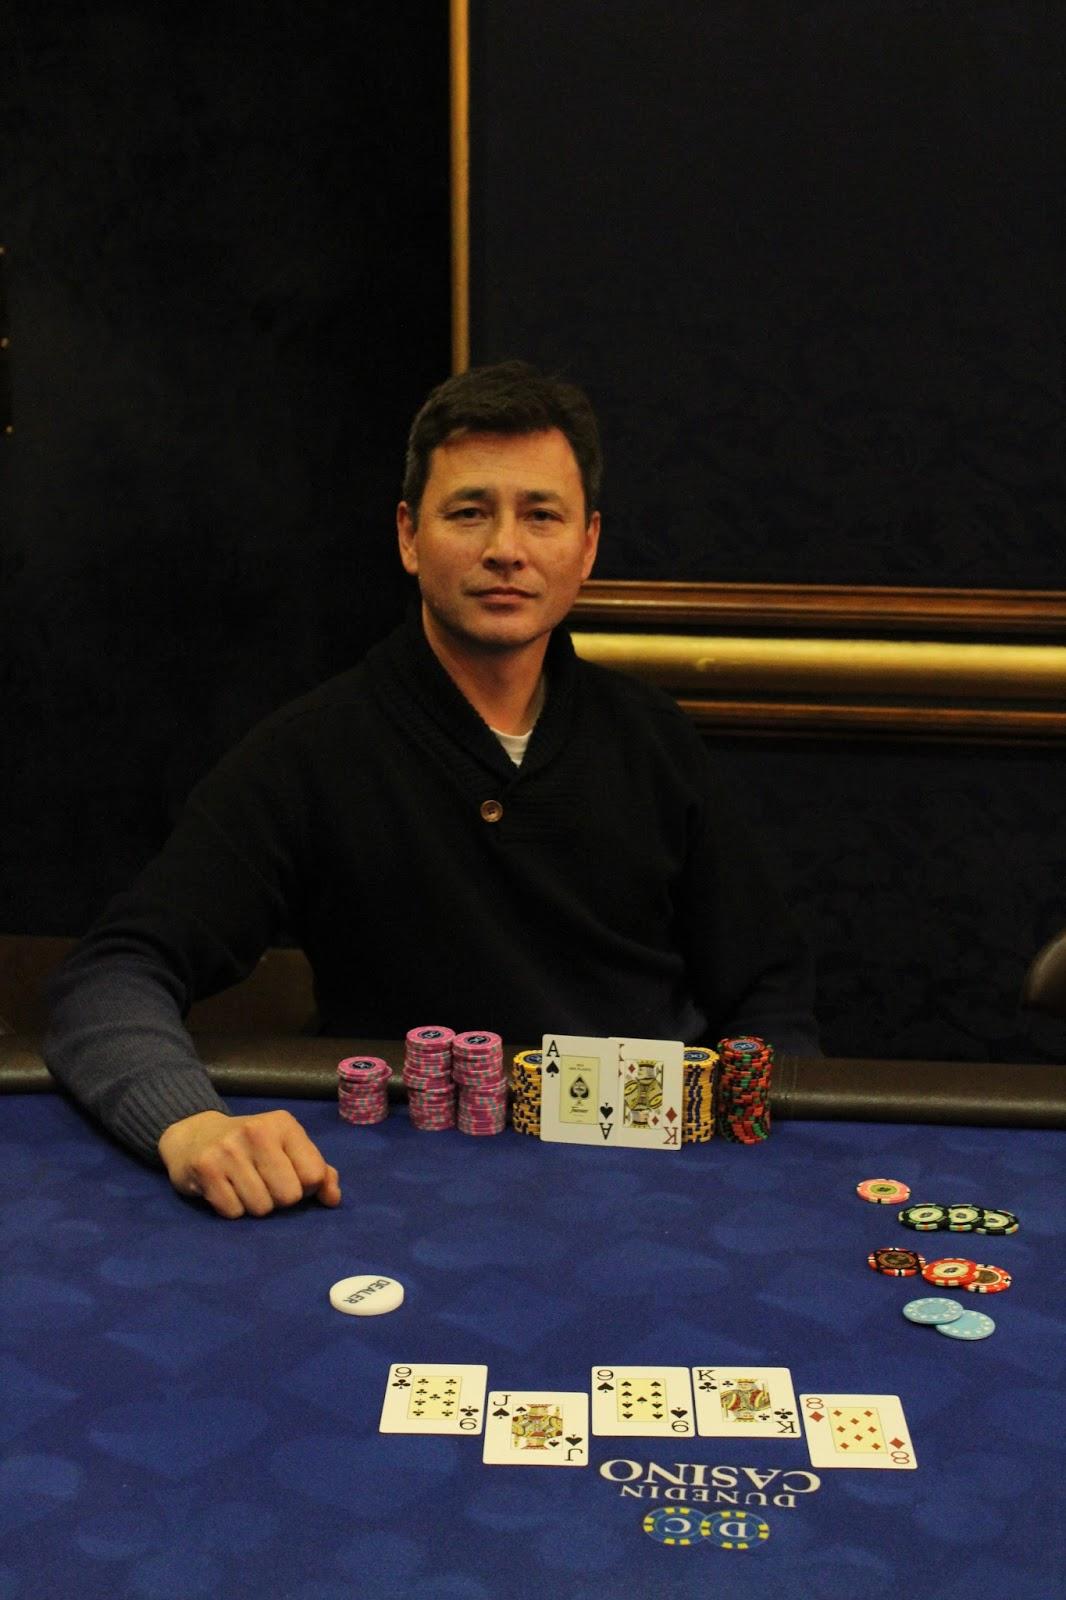 Weekly Wednesday Poker Dunedin Casino $20 Texas Holdem